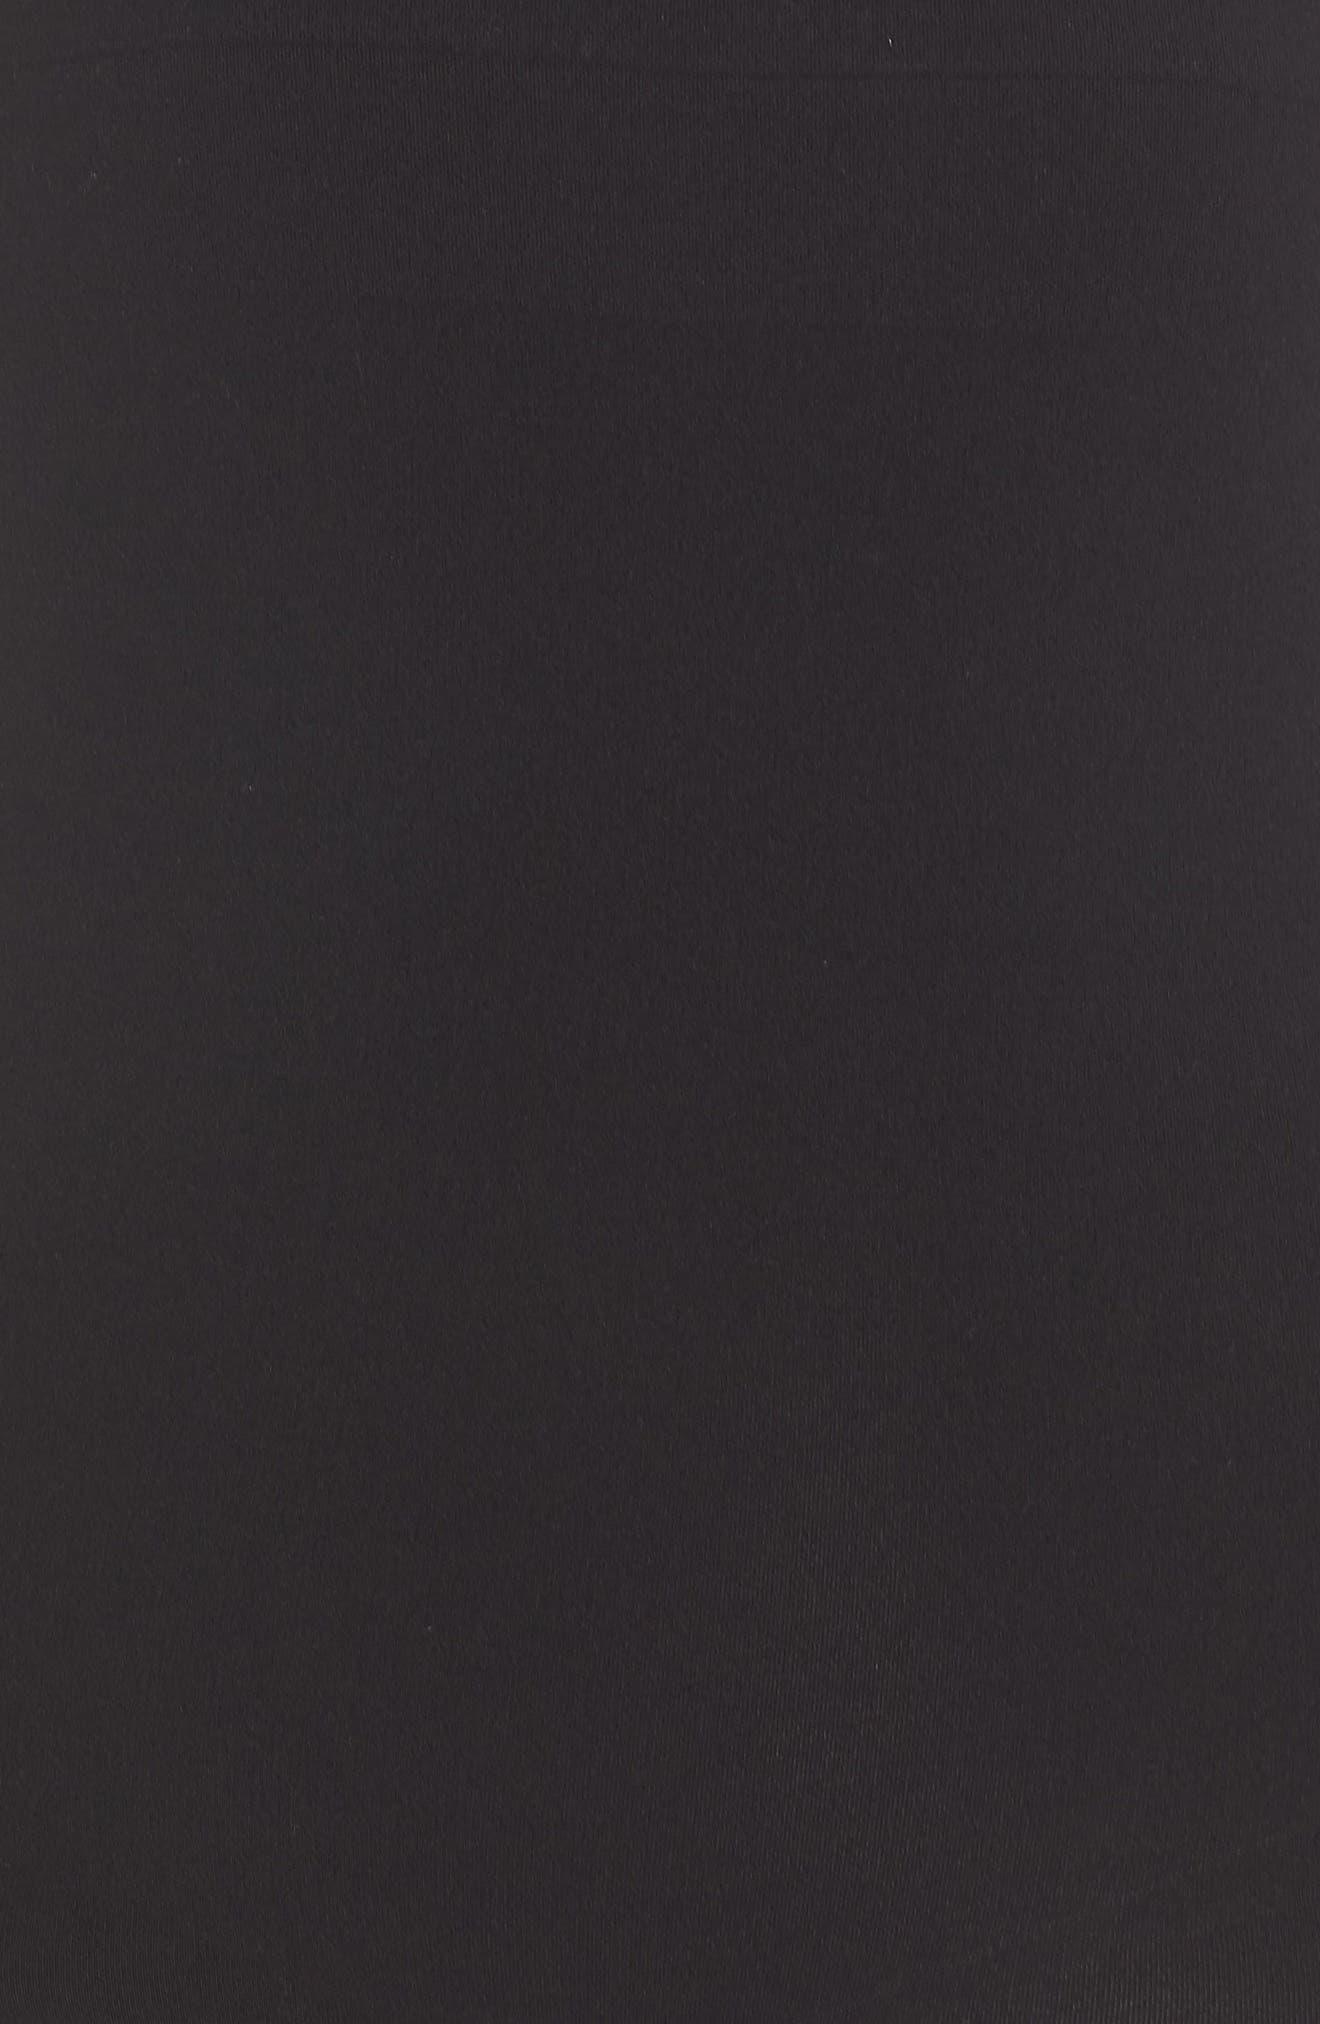 Higher Power Shaper Panties,                             Alternate thumbnail 6, color,                             VERY BLACK